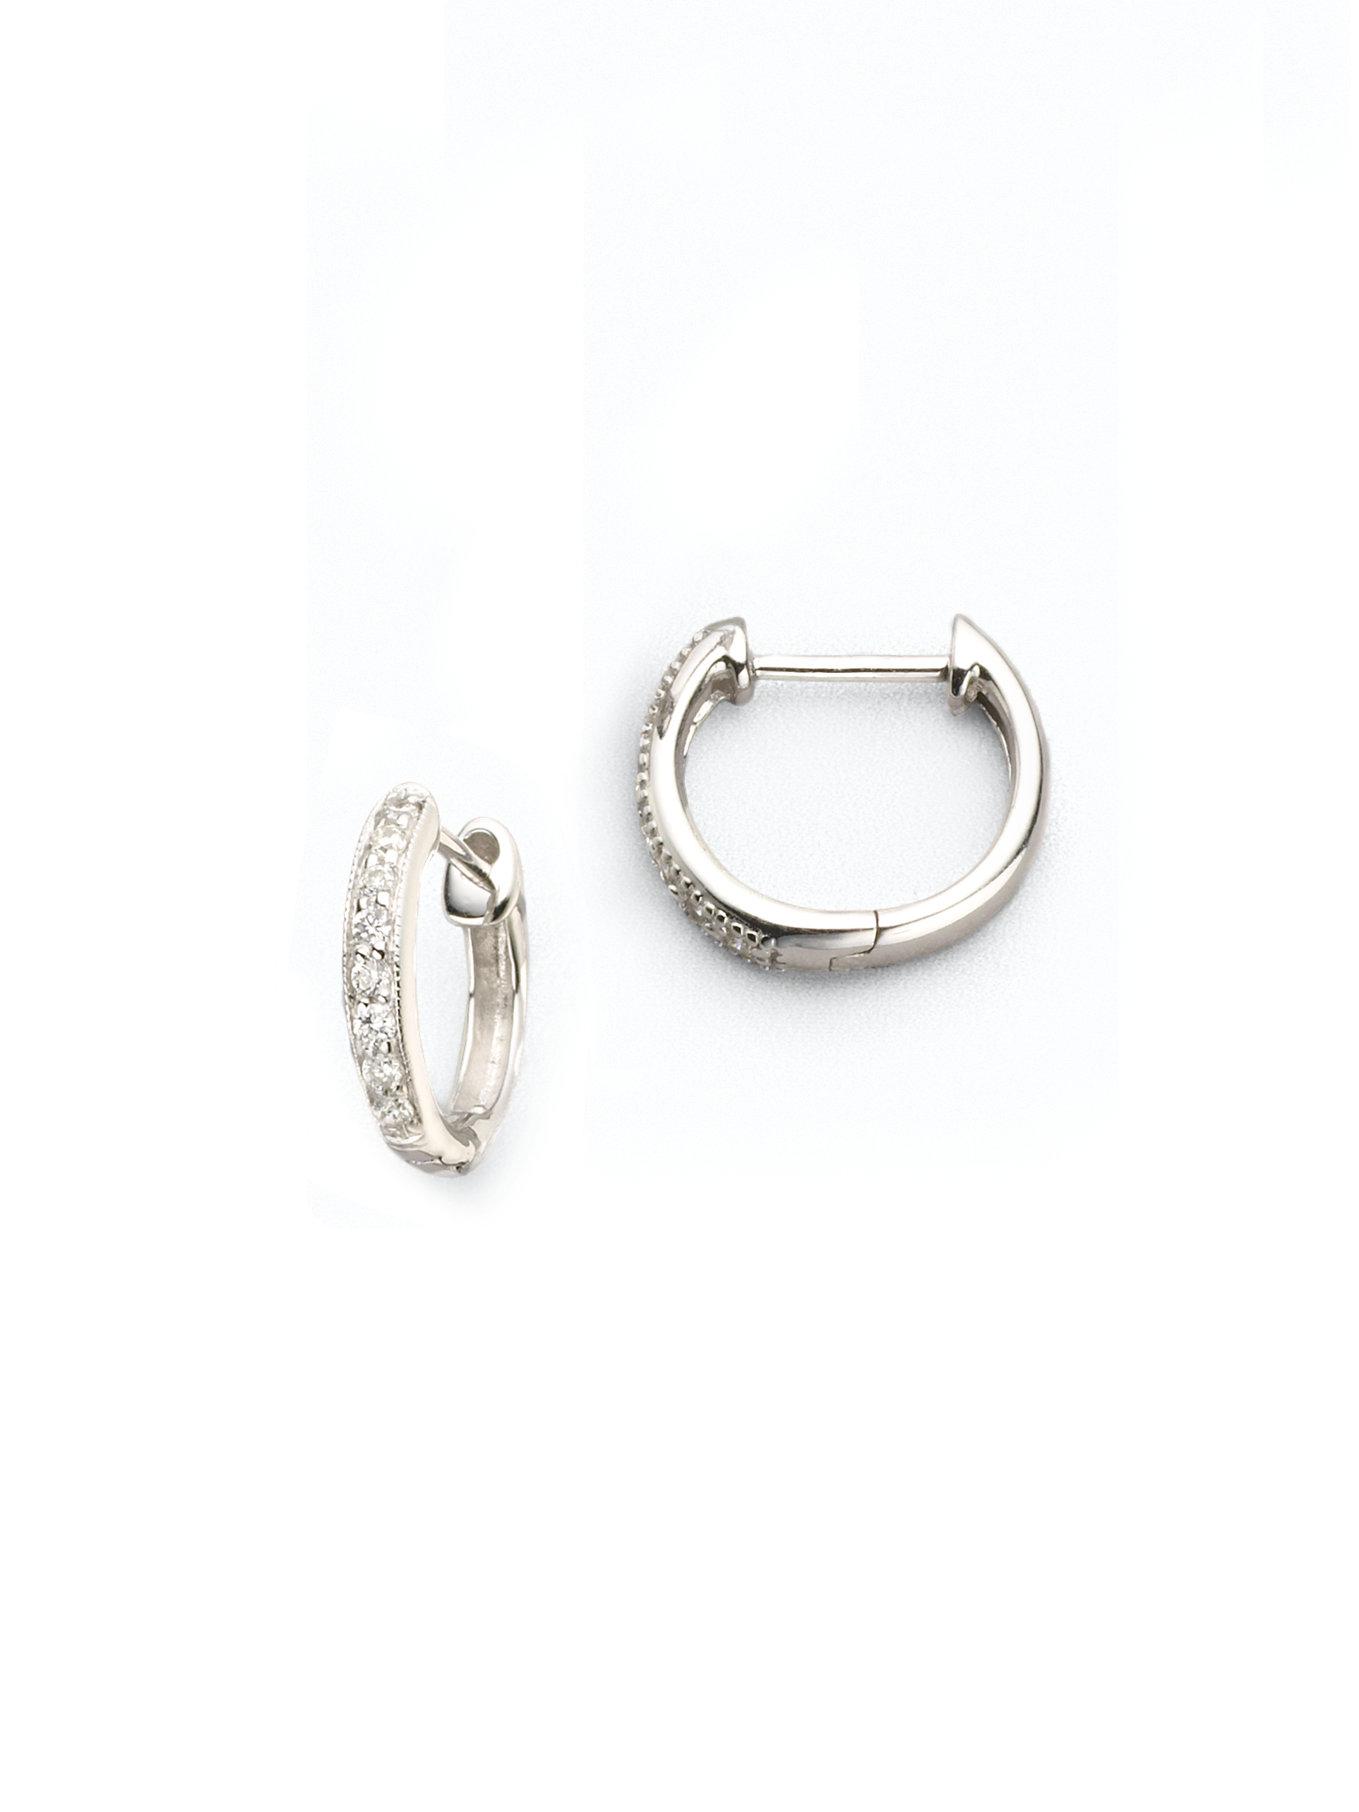 Jude frances Classic Diamond & 18k White Gold Huggie Hoop Earrings